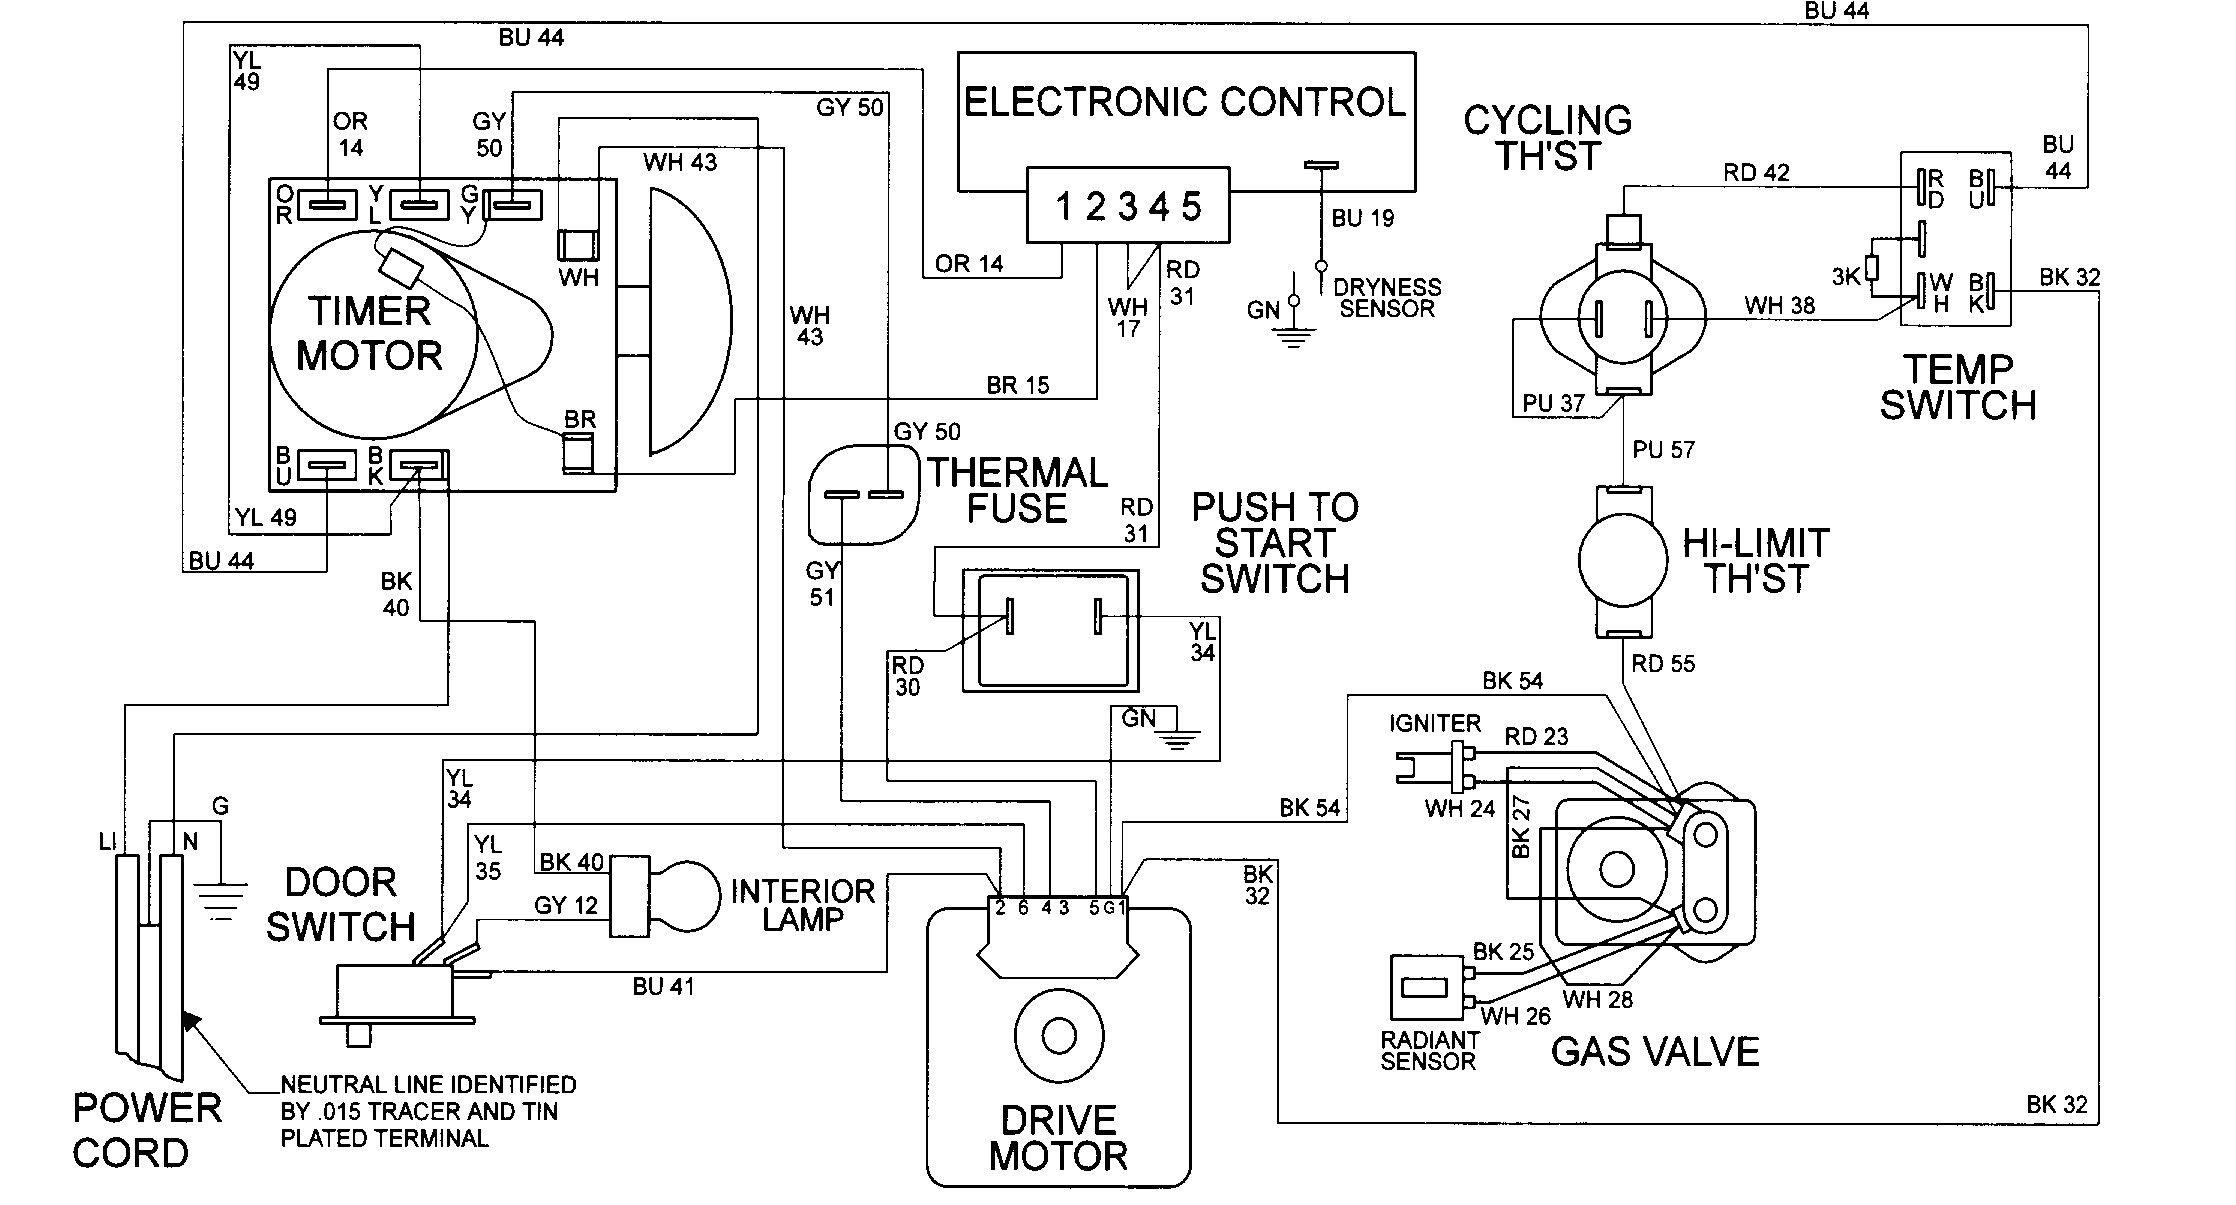 Evinrude Power Pack Wiring Diagram Elegant In 2020 Maytag Dryer Electric Dryers Gas Dryer